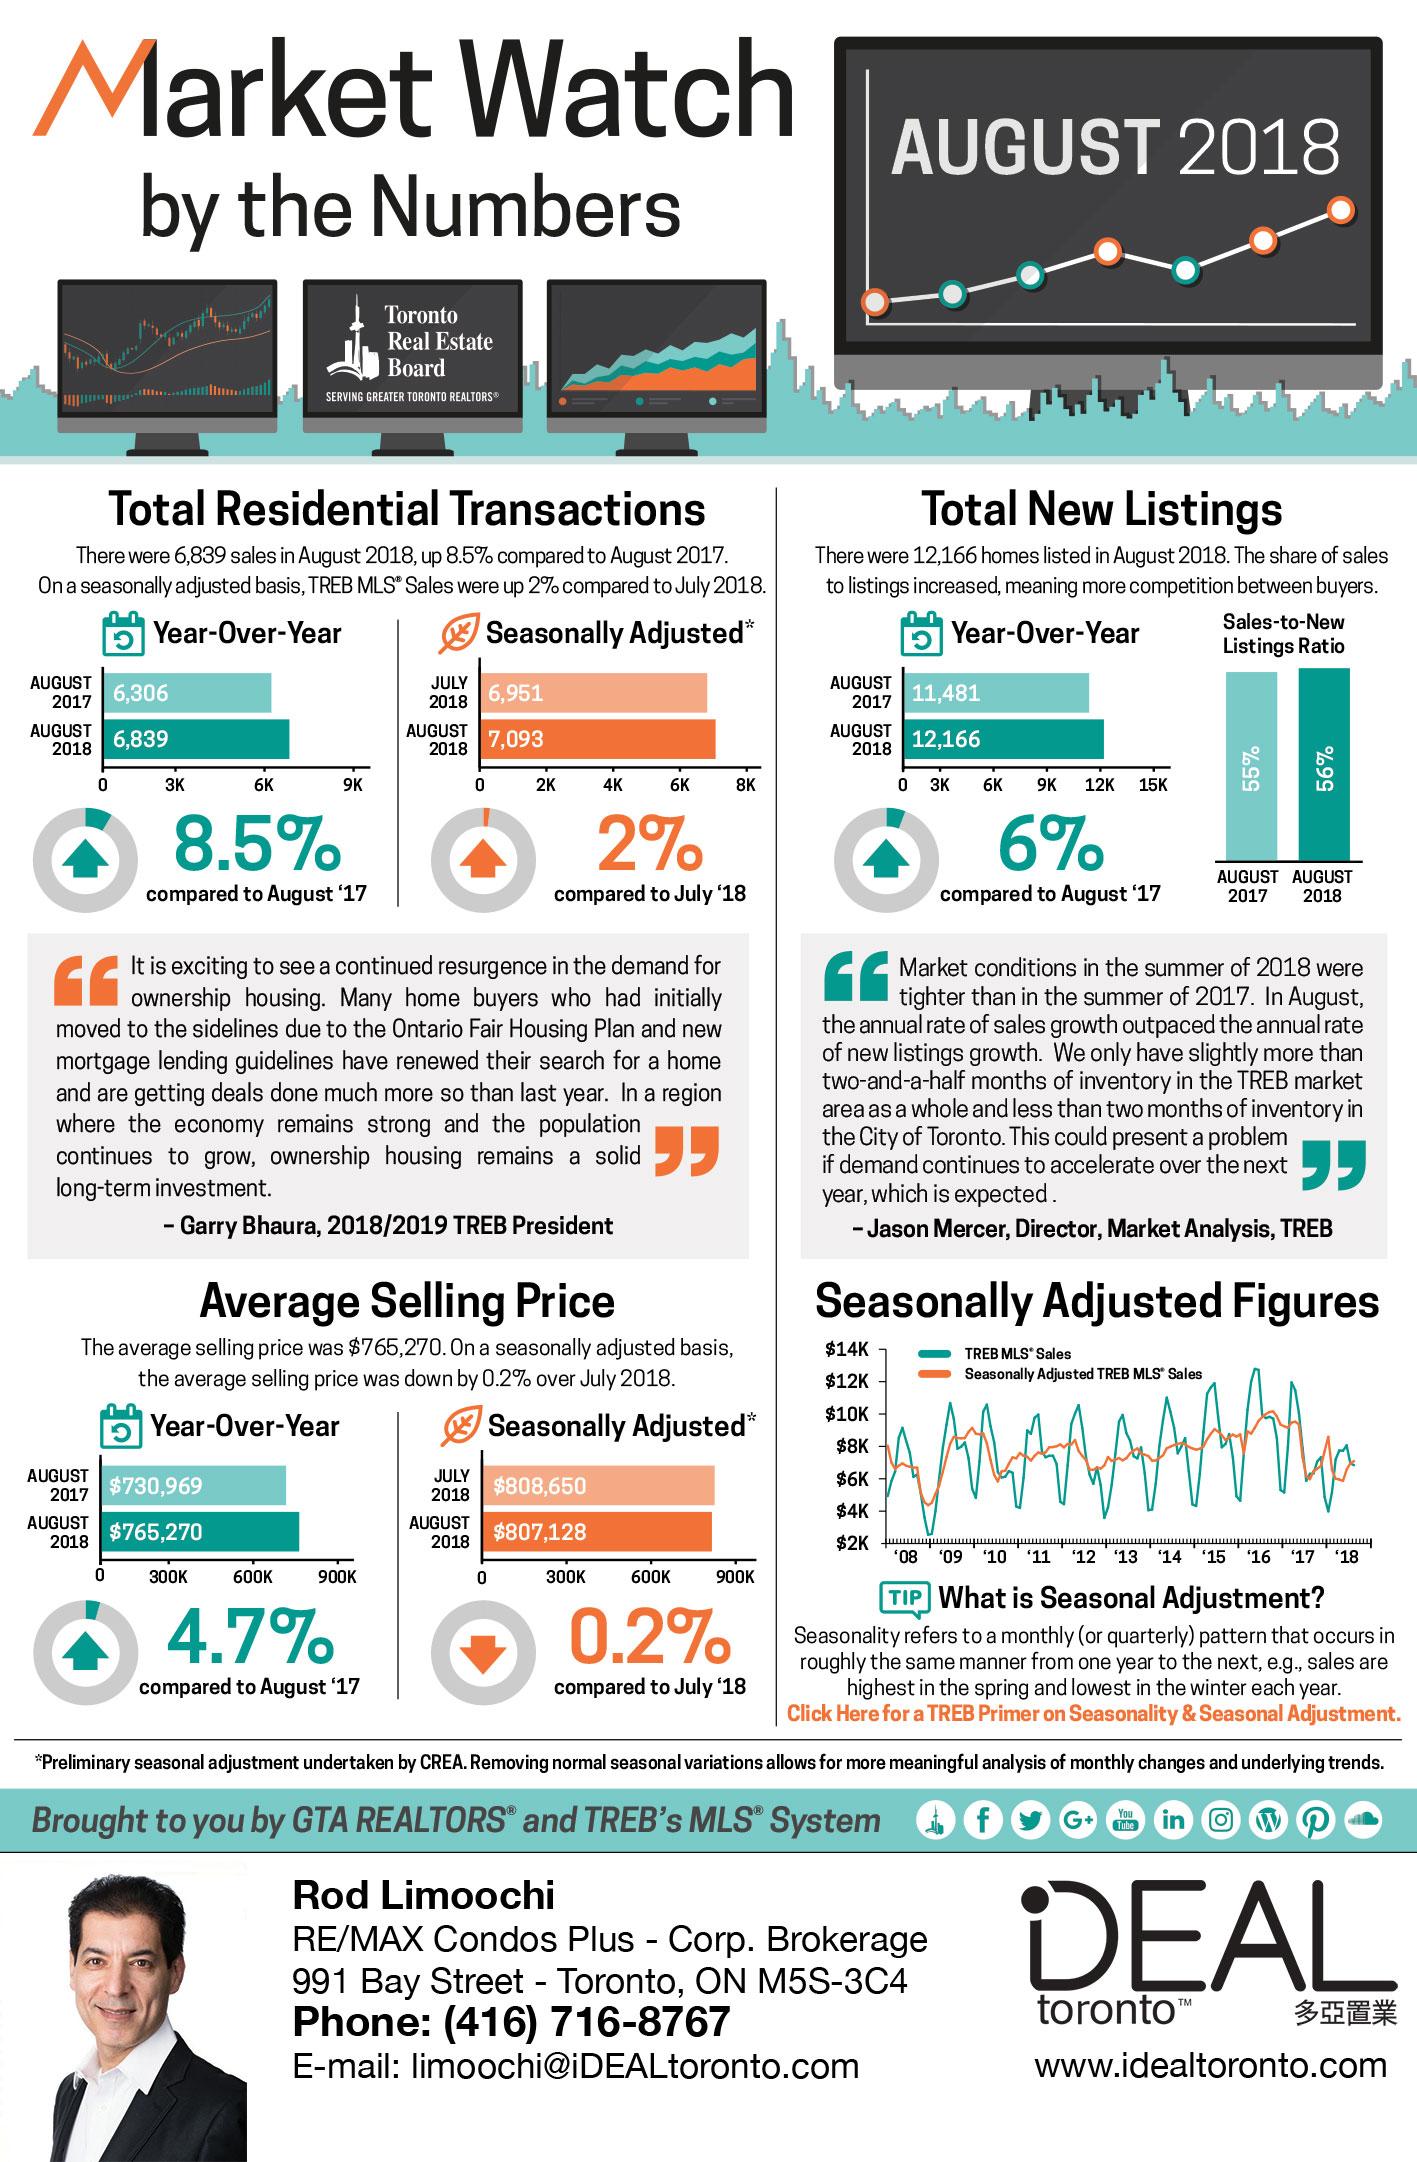 Market Watch infographic August 2018